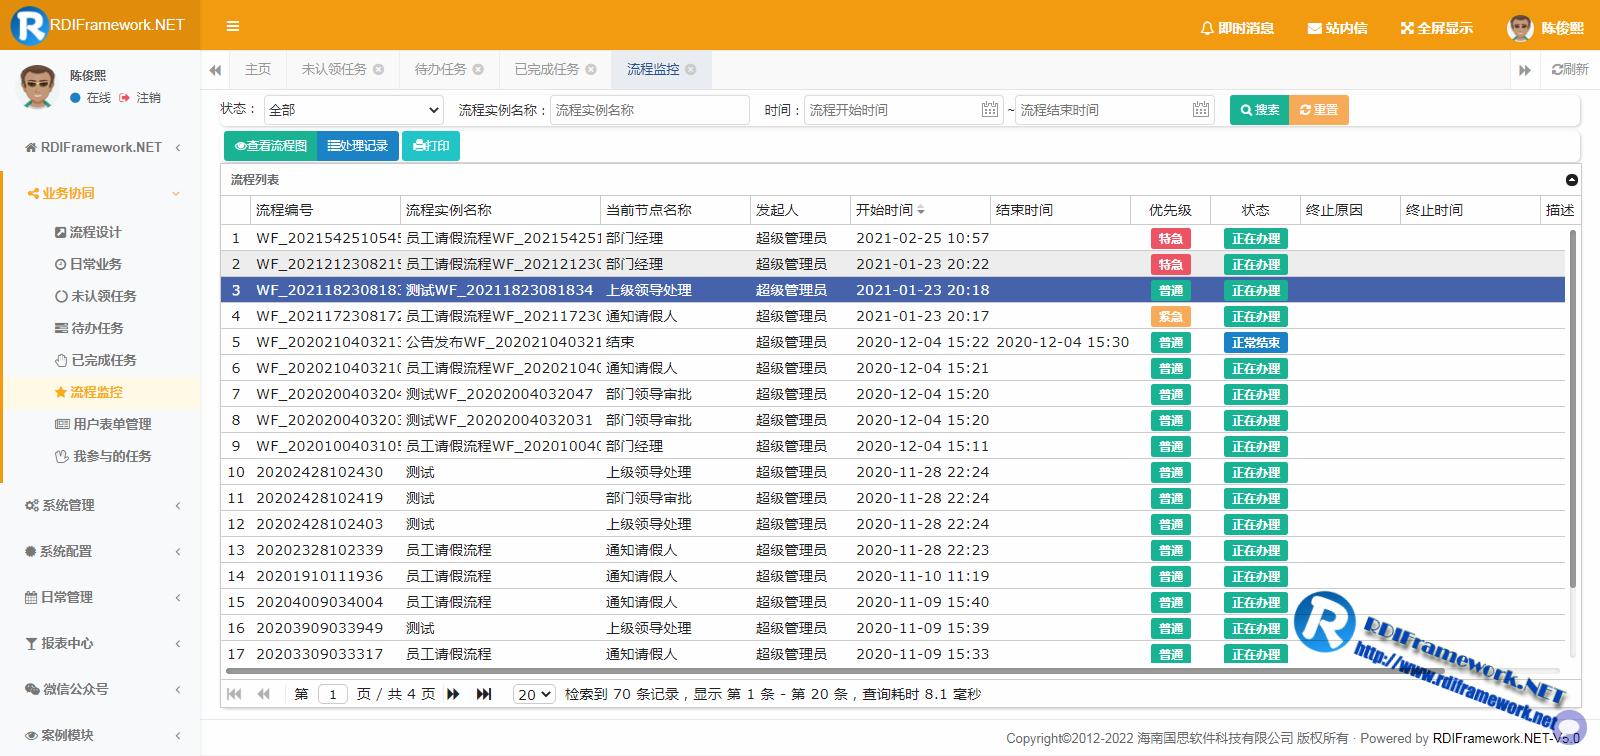 Web业务平台-流程监控